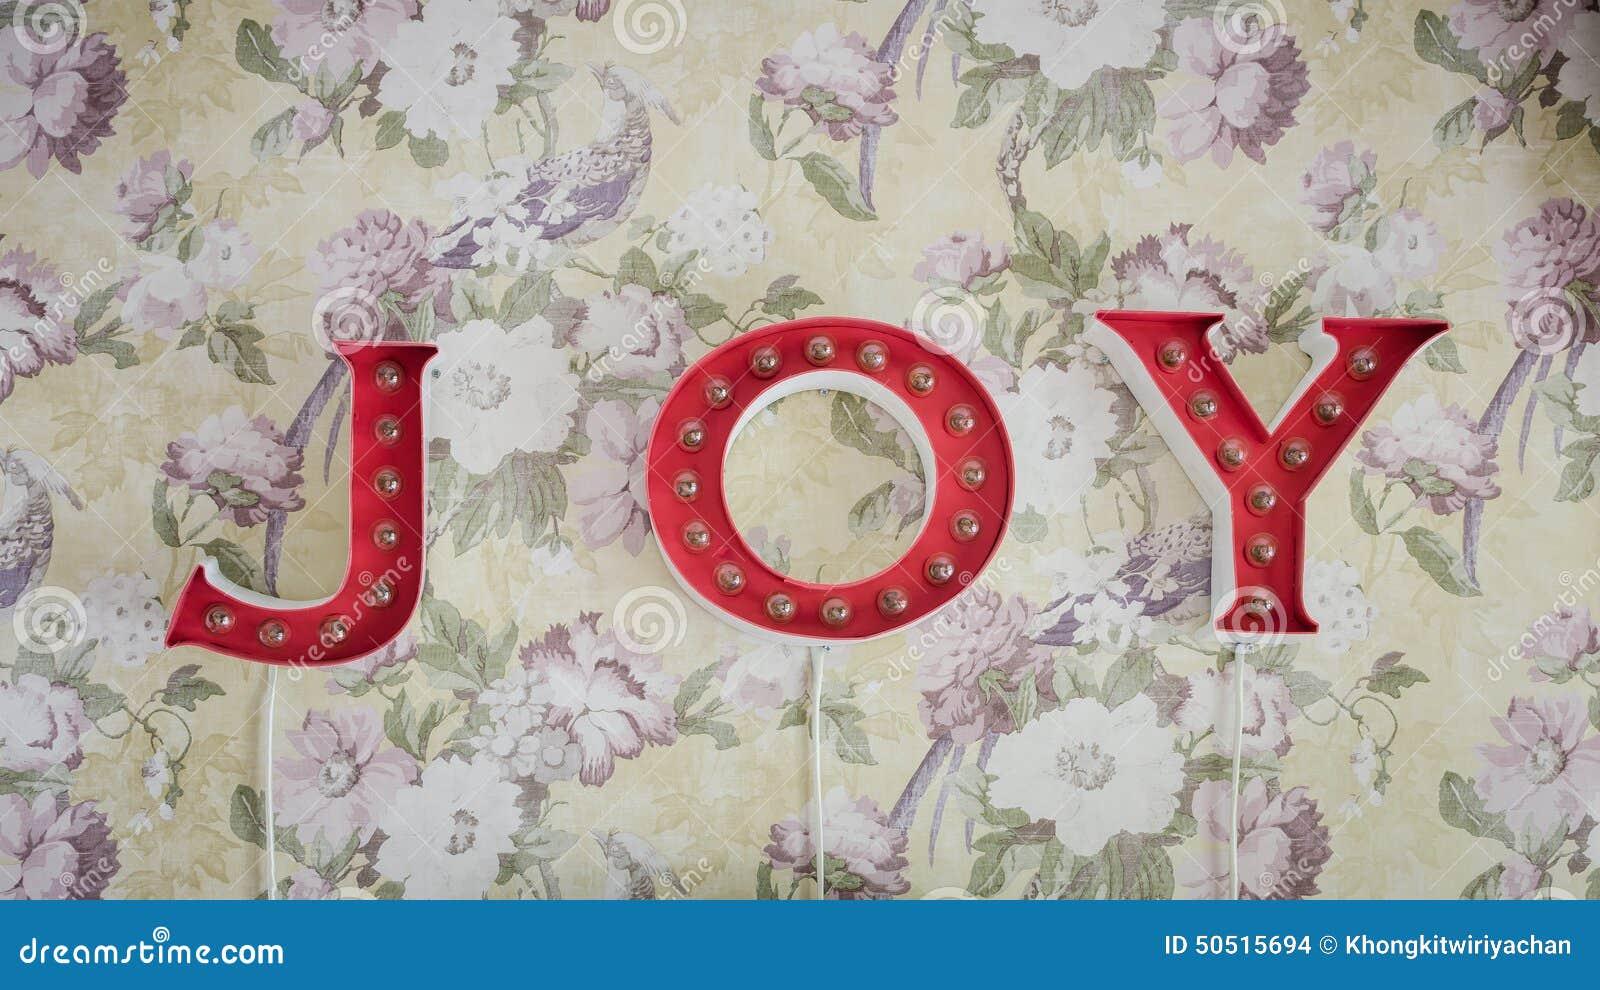 word joy hang on wallpaper stock photo. image of symbol - 50515694